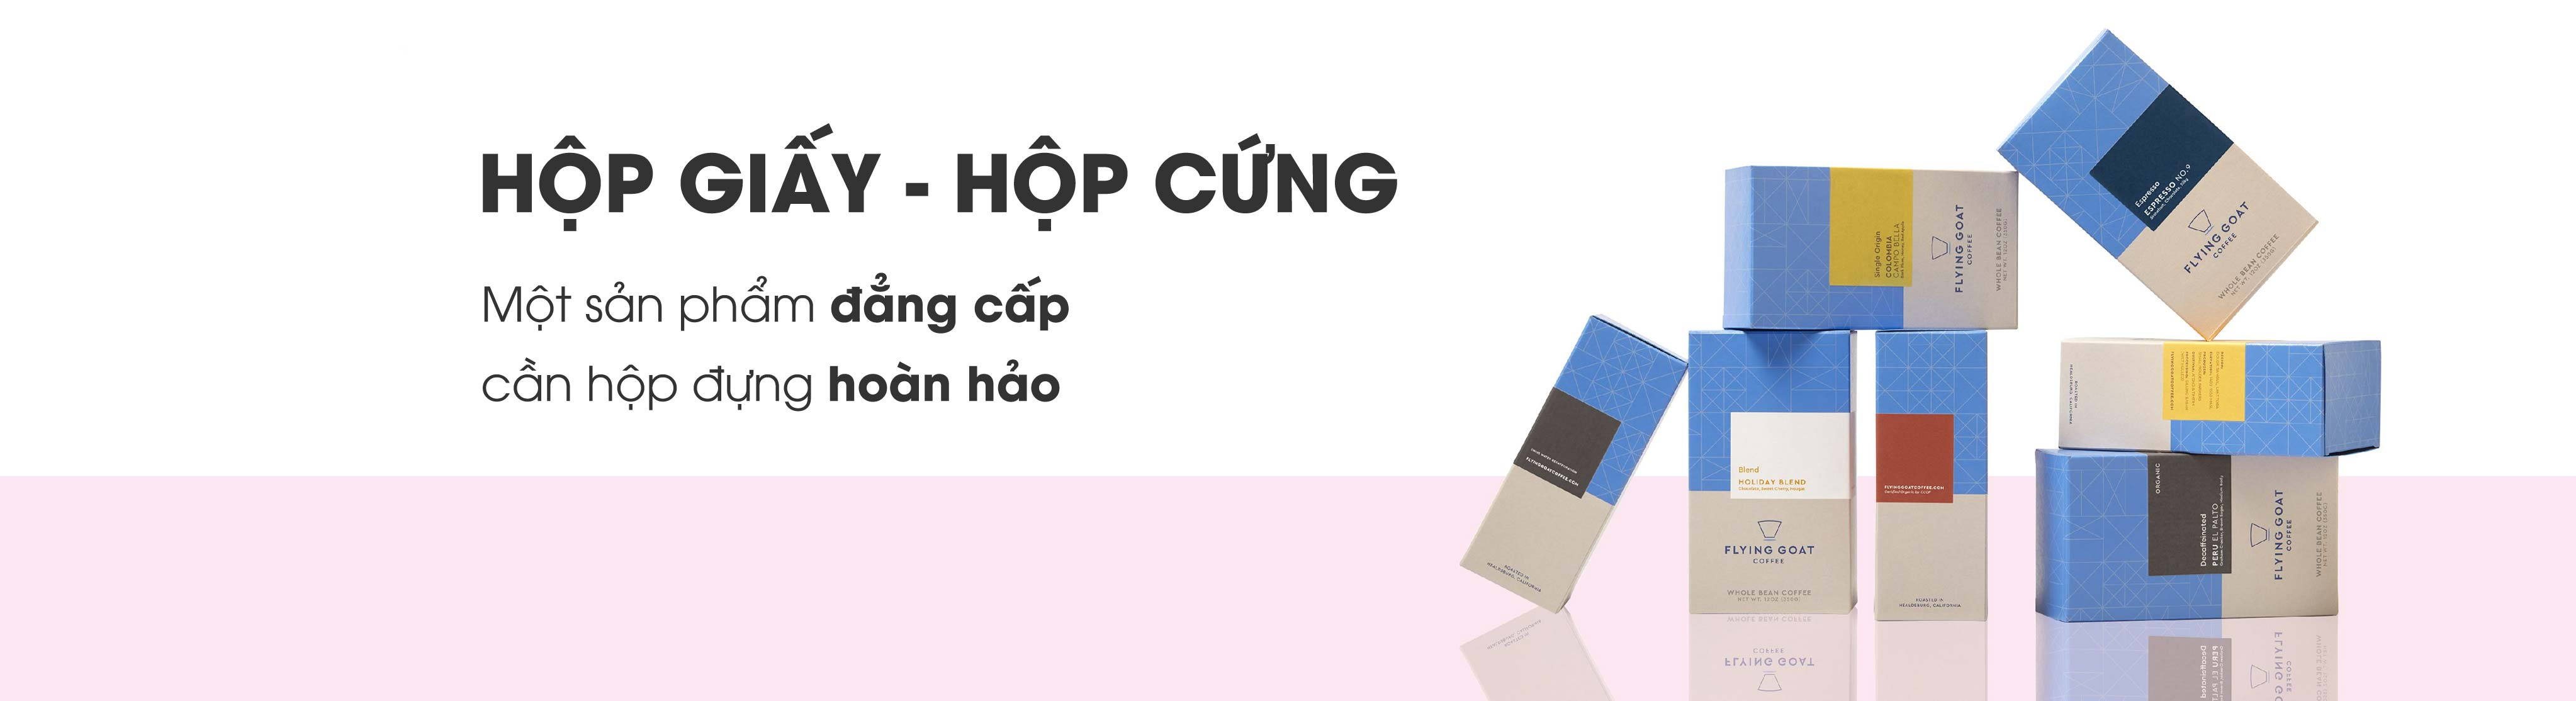 slide-hop-giay